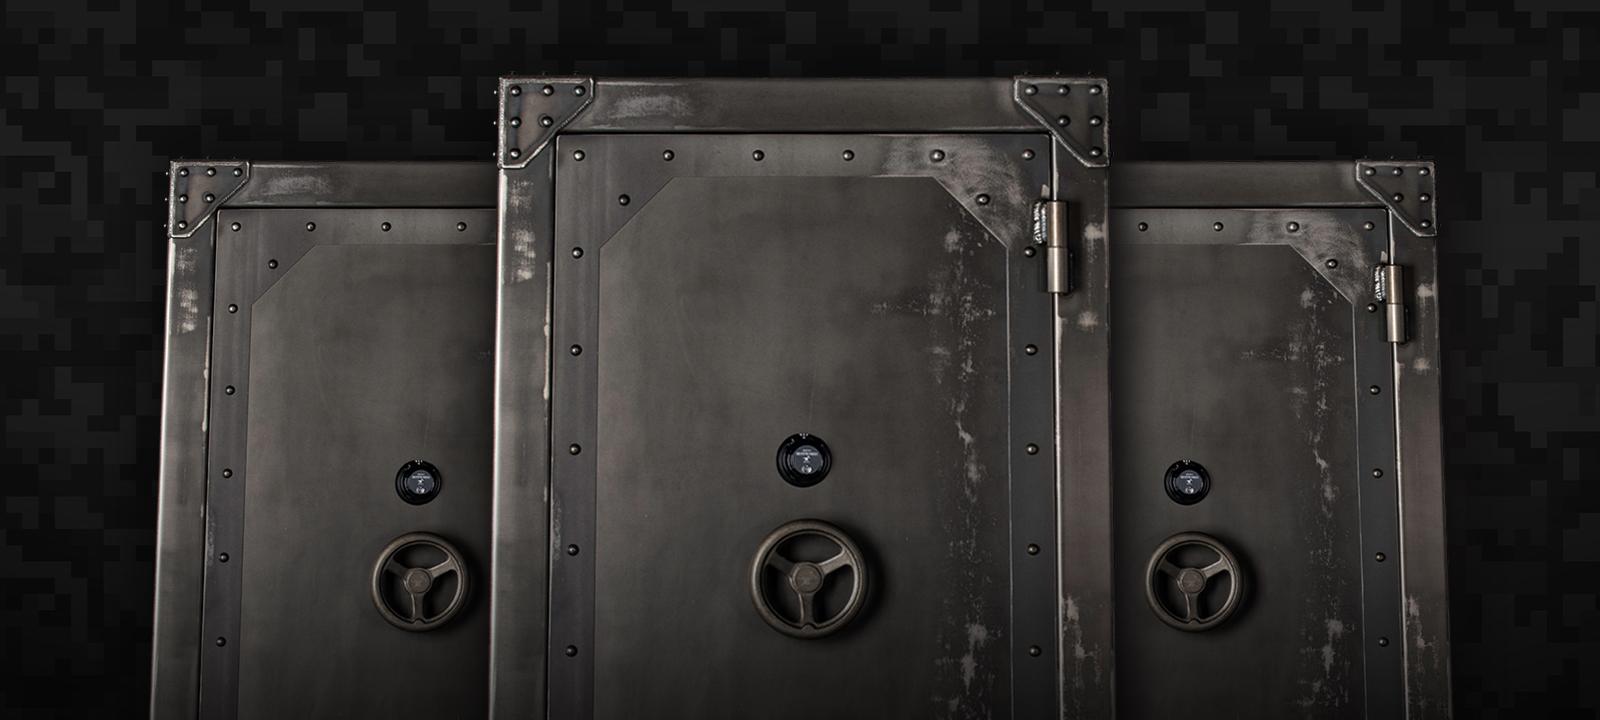 Rhino Metals Ironworks Safes